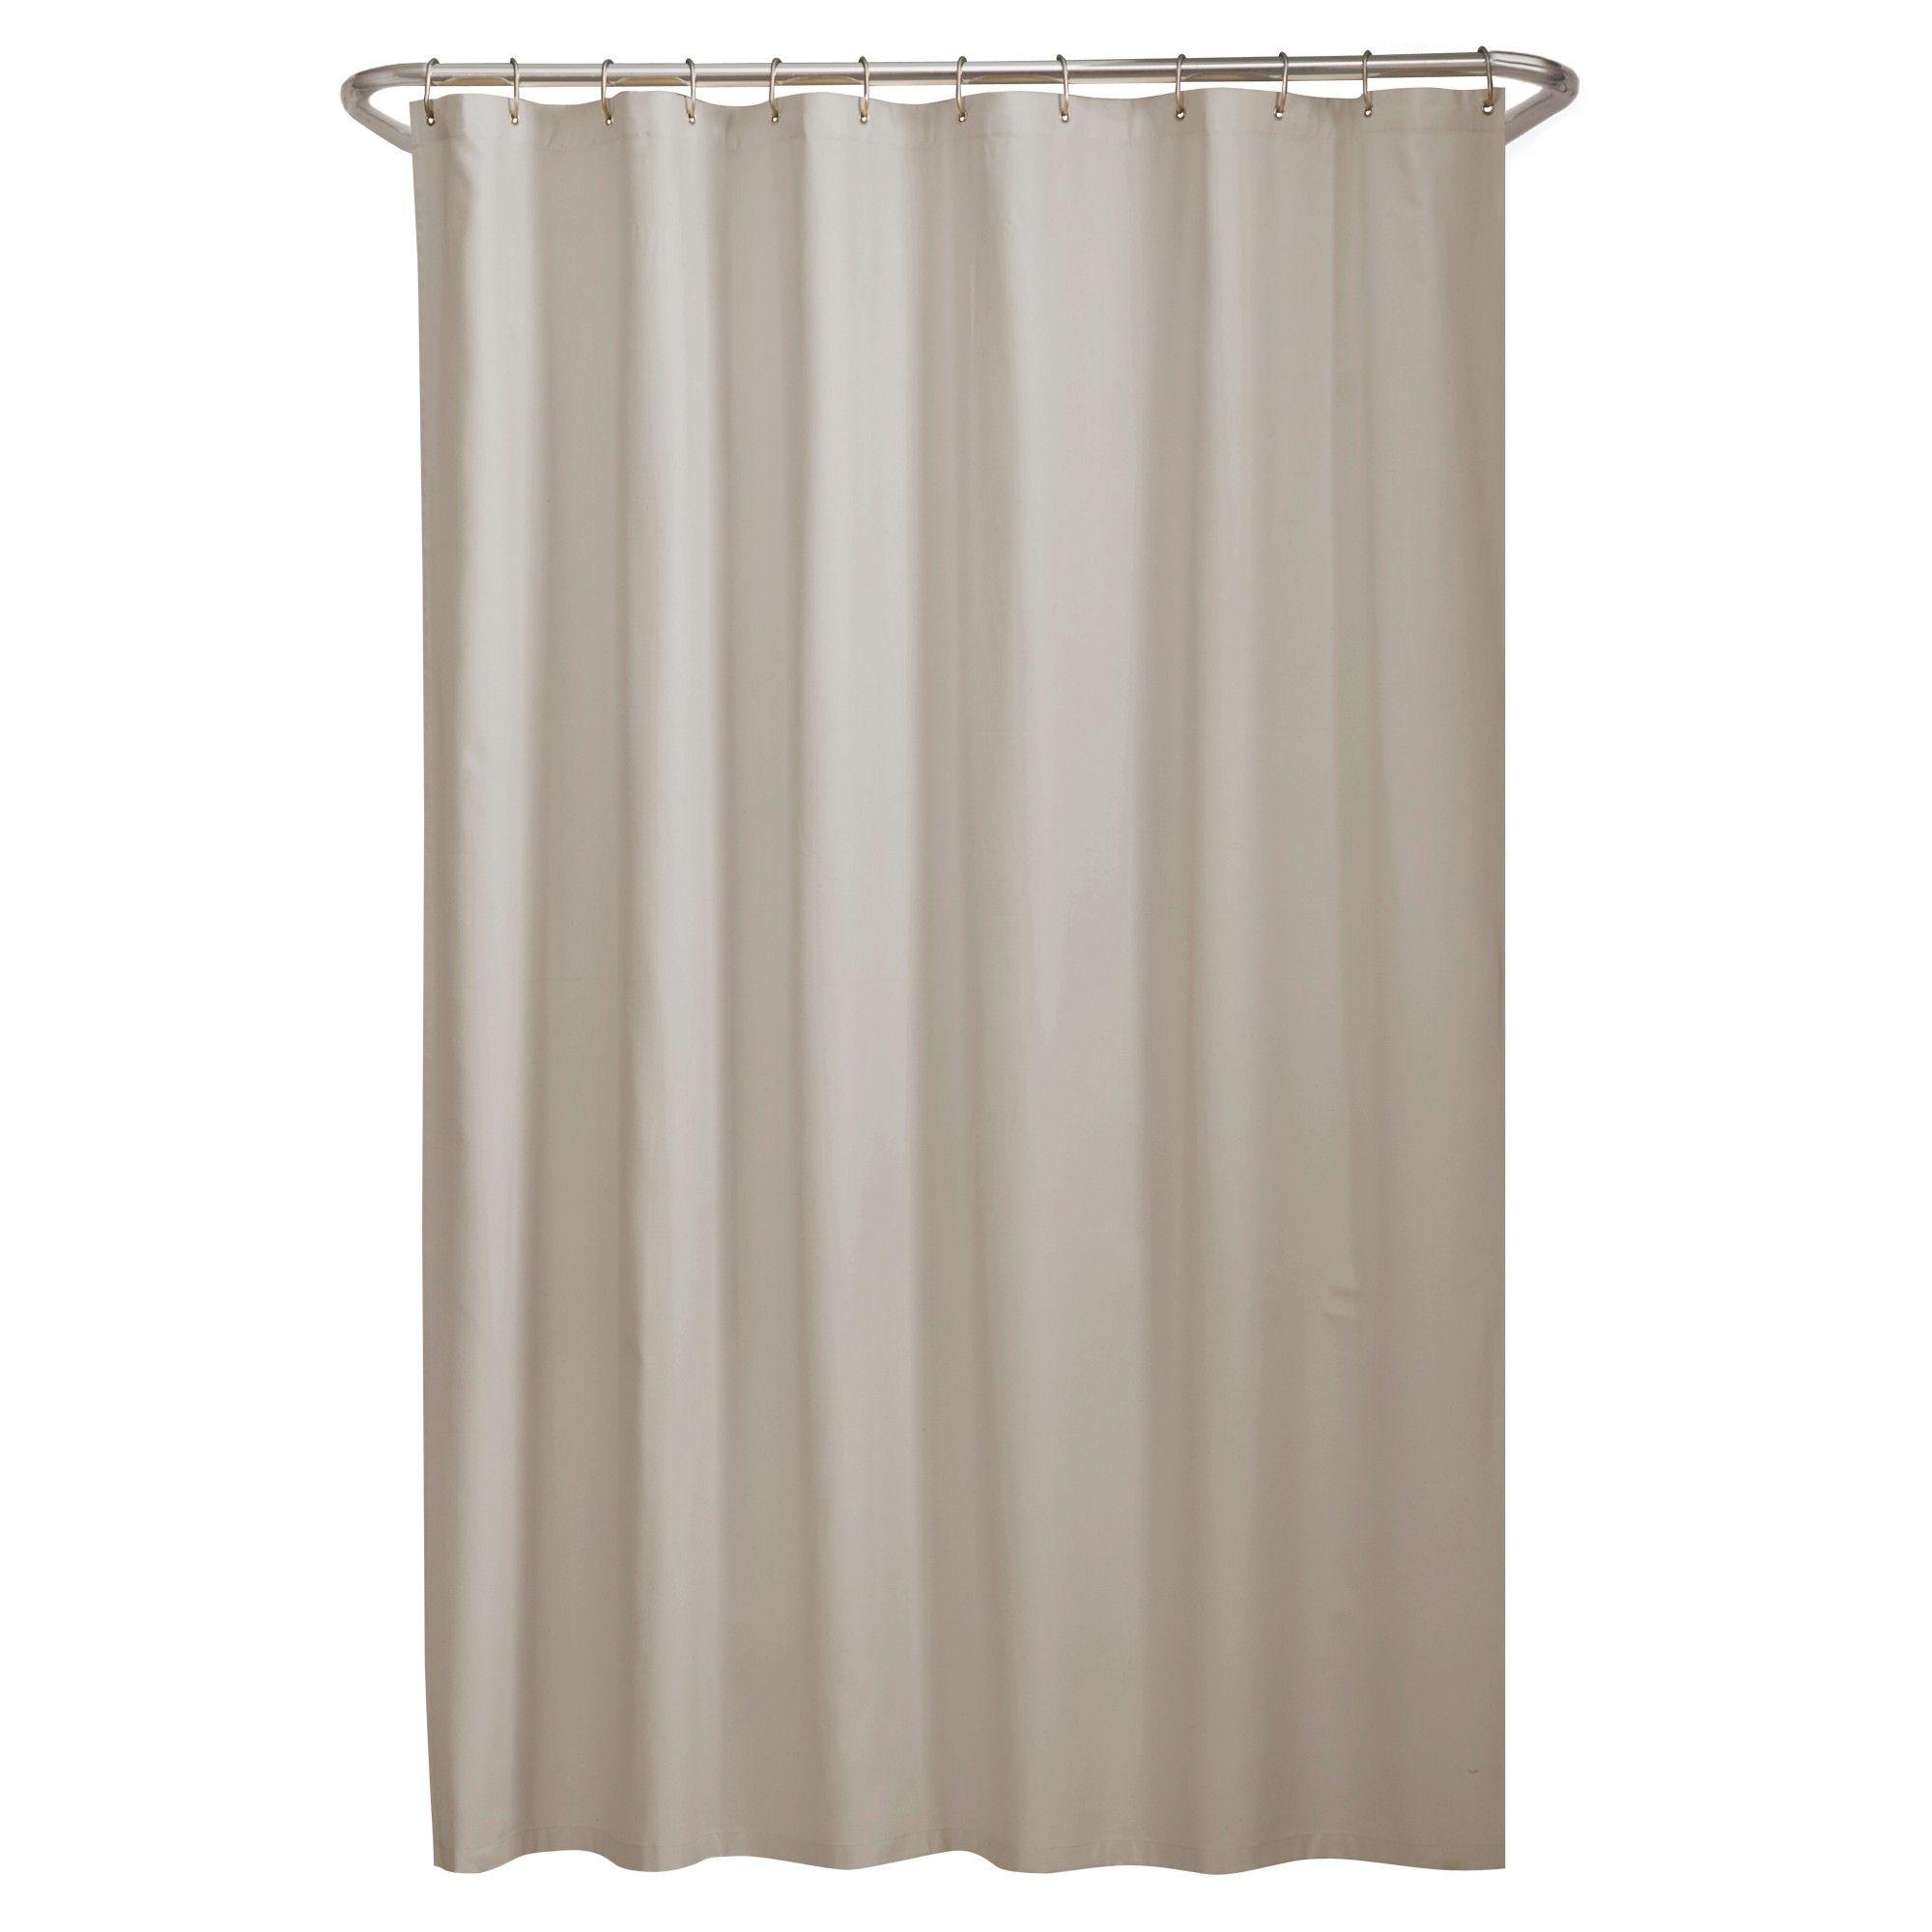 Water Repellant Microfiber Shower Liner Cream Maytex Fabric